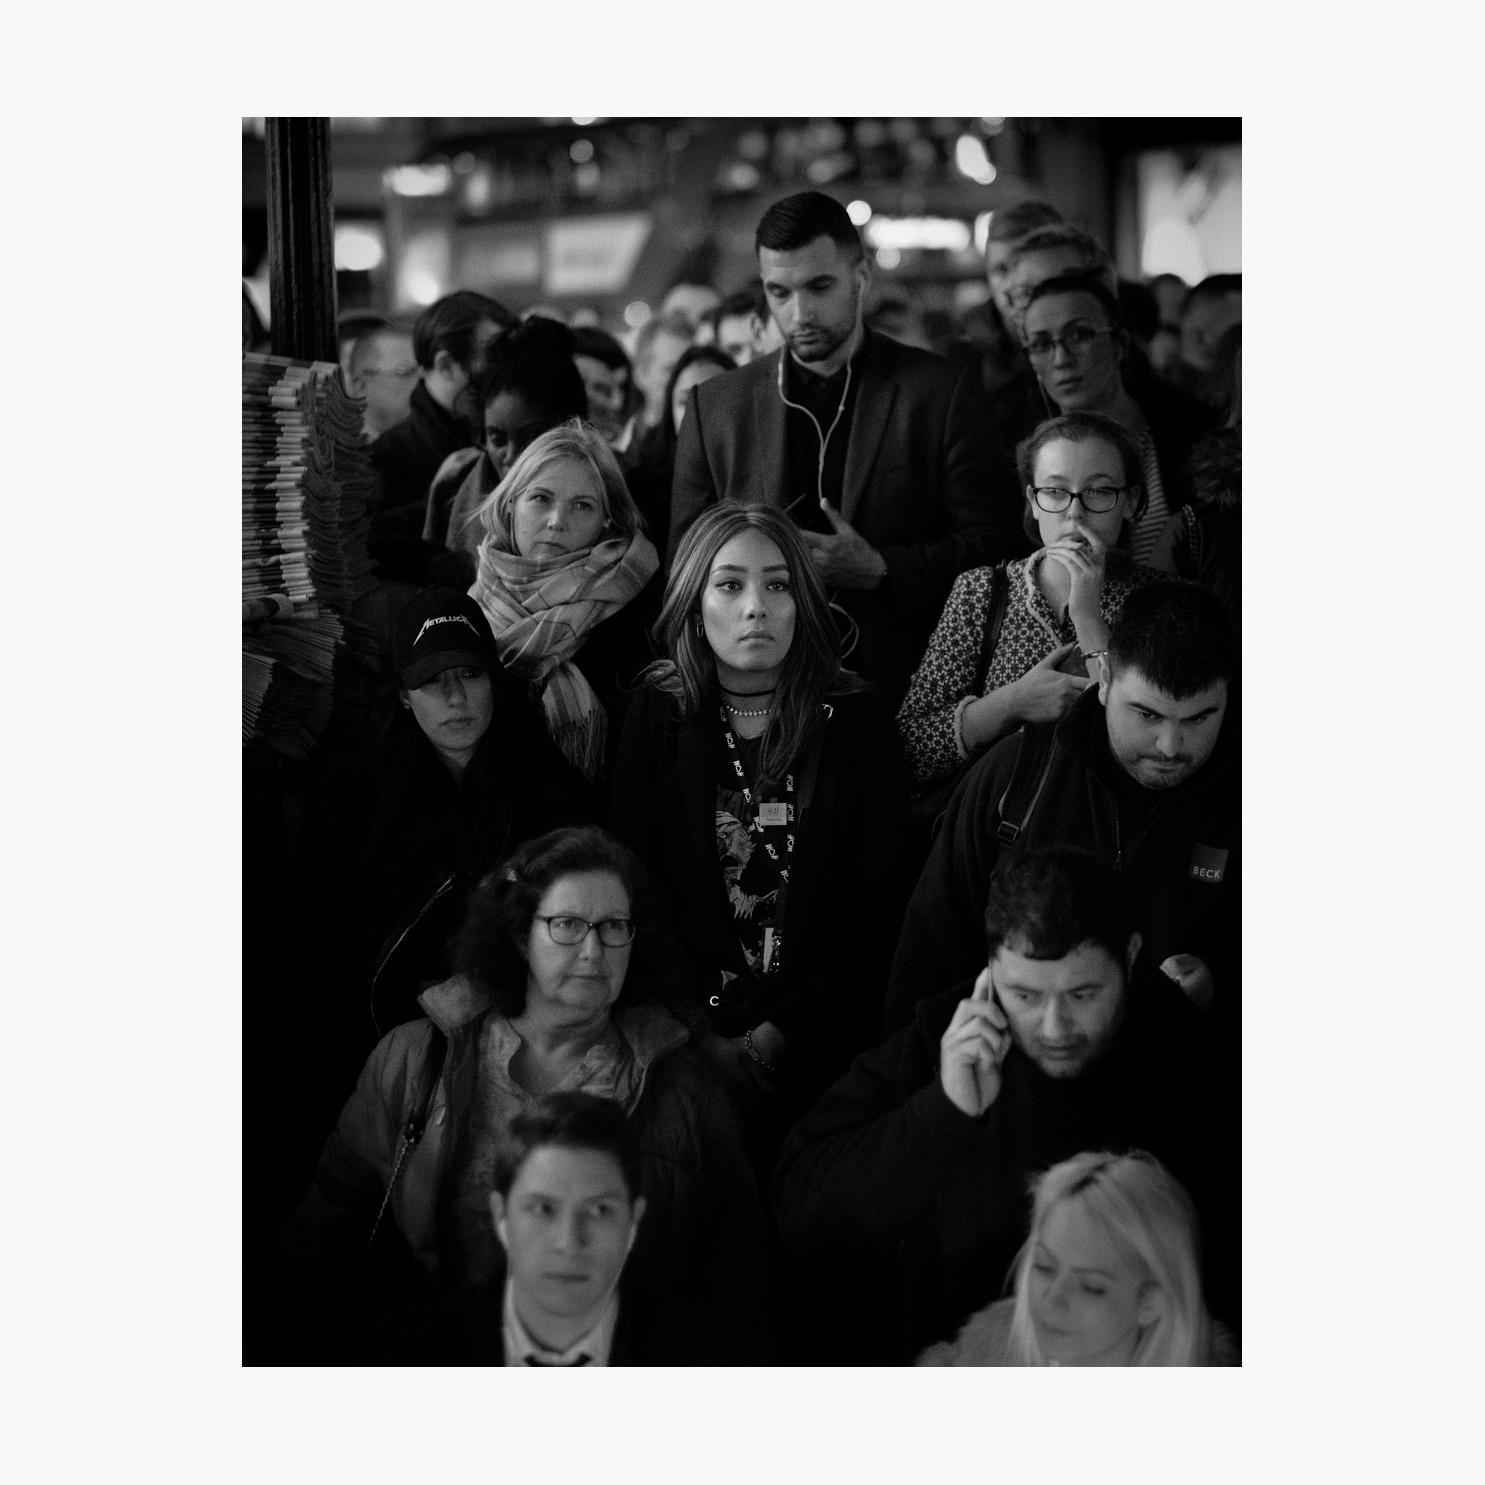 ©-Harry-W-Edmonds-2018-@photographersnote-Street-Sights-Social-PN06.jpg